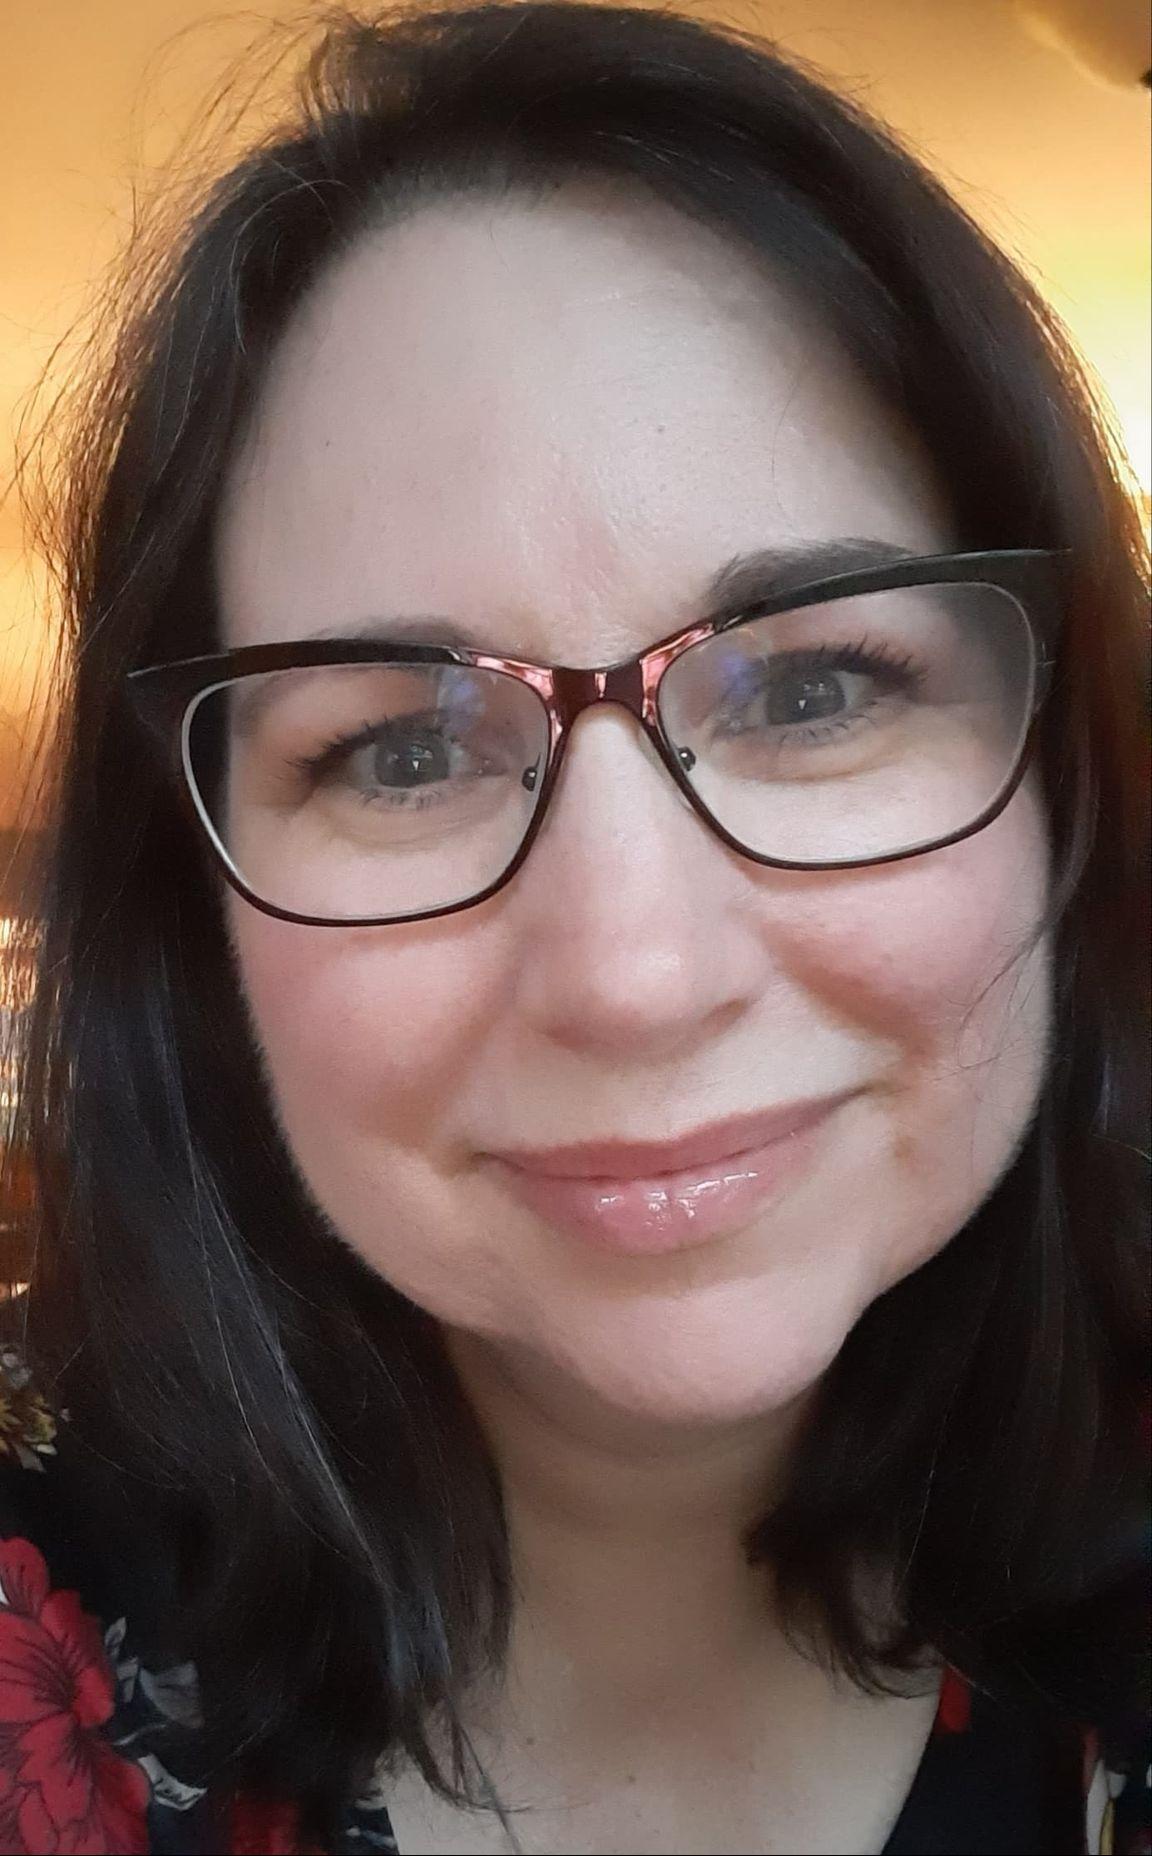 Lisa headshot selfie 2020 10 21